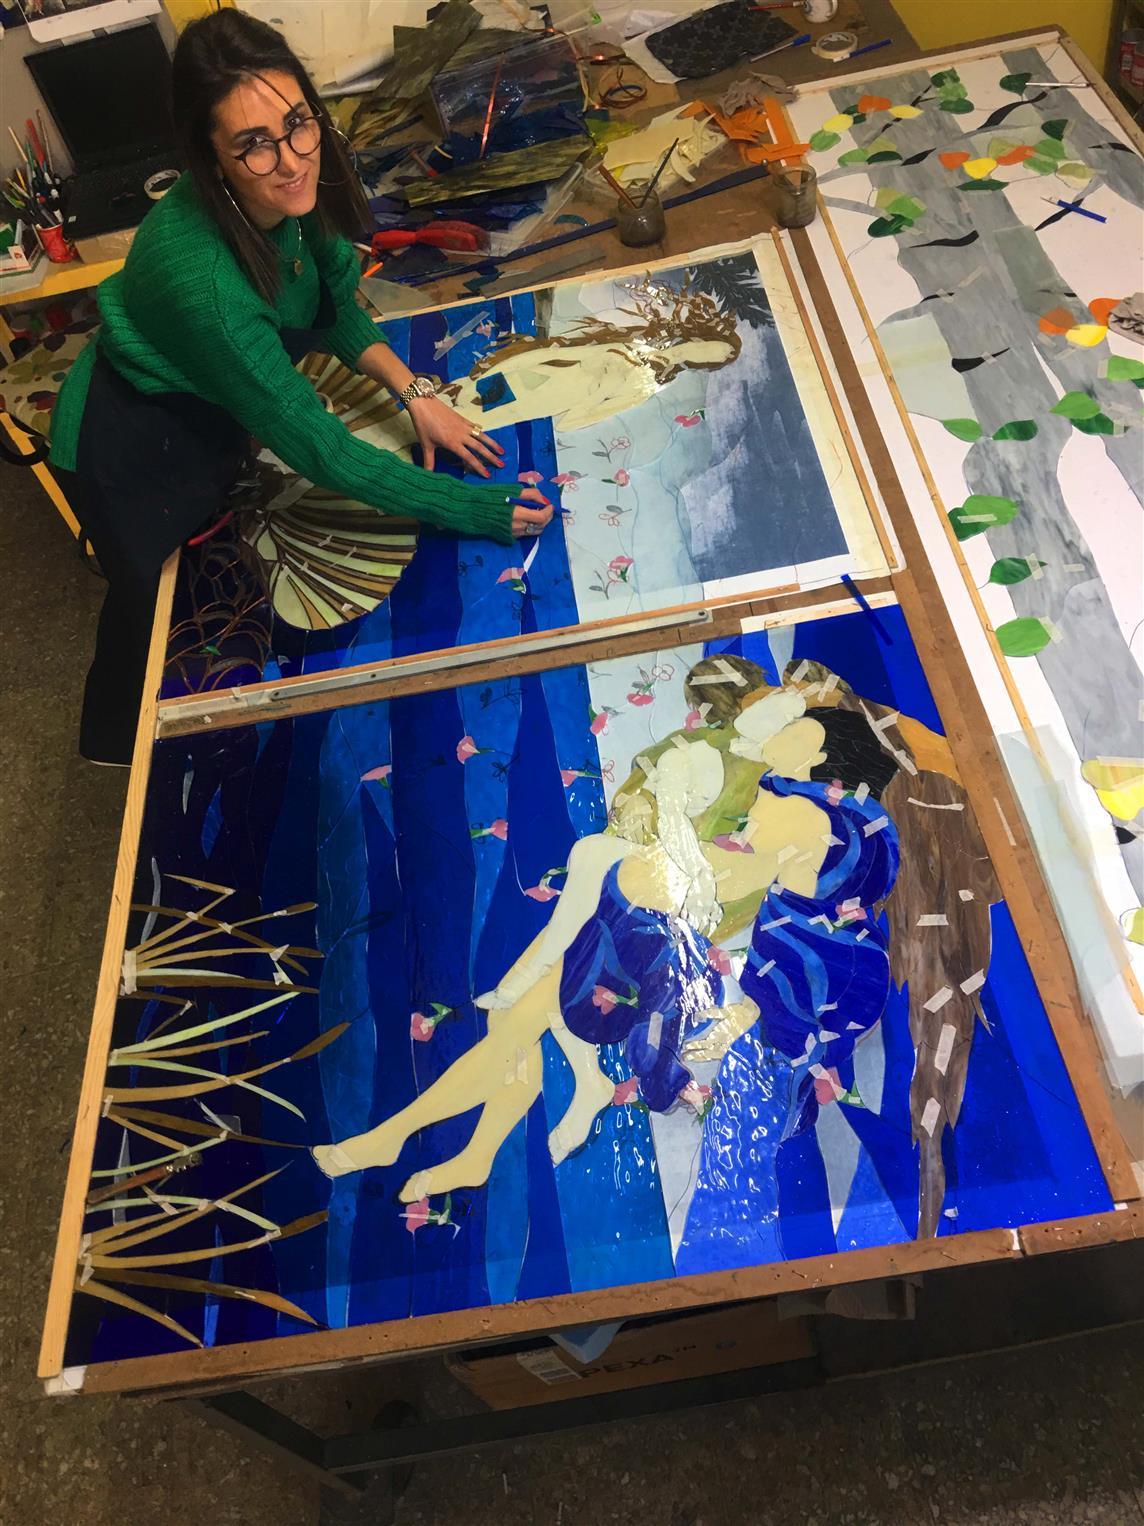 venusun-dogusu-sandro-botticelli-vitray-uyarlamasi-datca-mugla-villa202012016234902.jpg izmir vitray çalışması